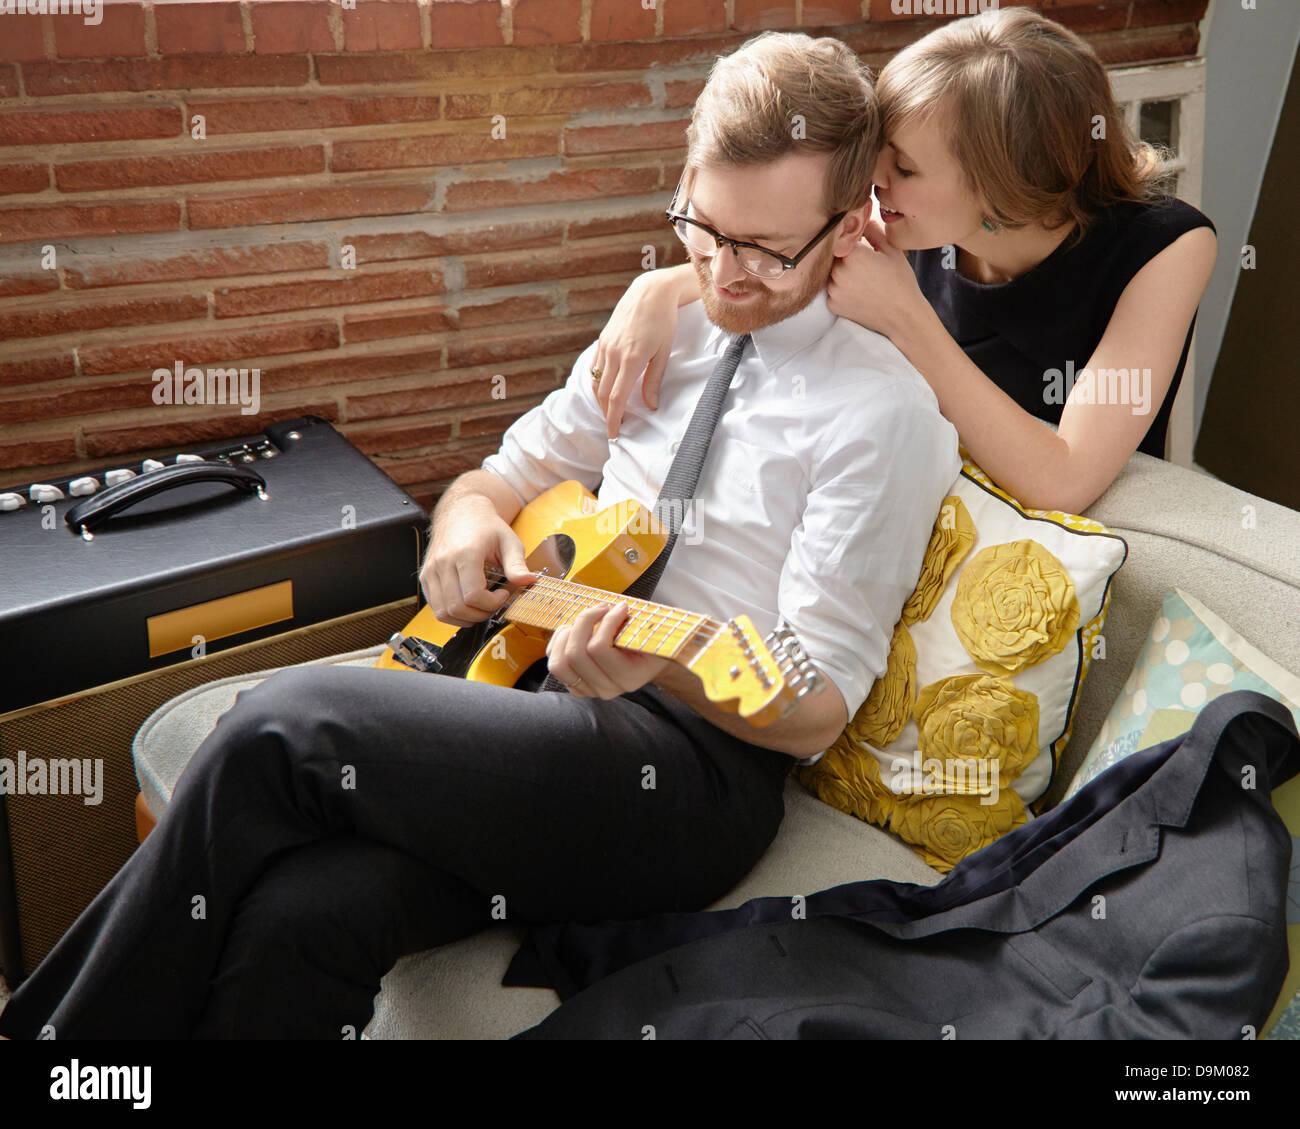 Mujer joven con pareja practicando en guitarra eléctrica Imagen De Stock